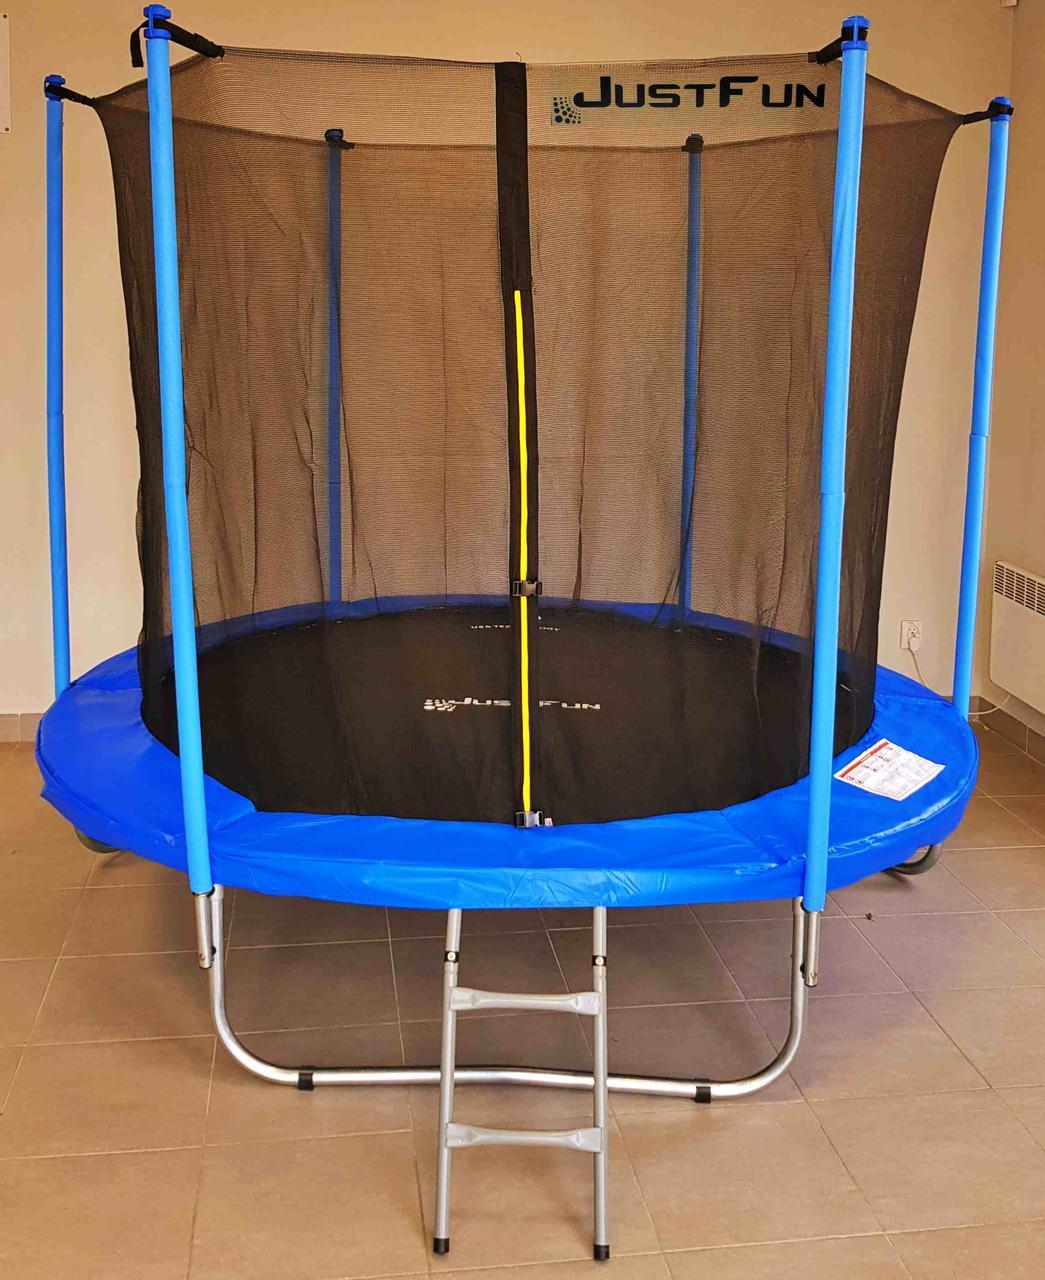 Батут Just Fun 305 см с внутренней сеткой и лестницей (B-JF305) Синий